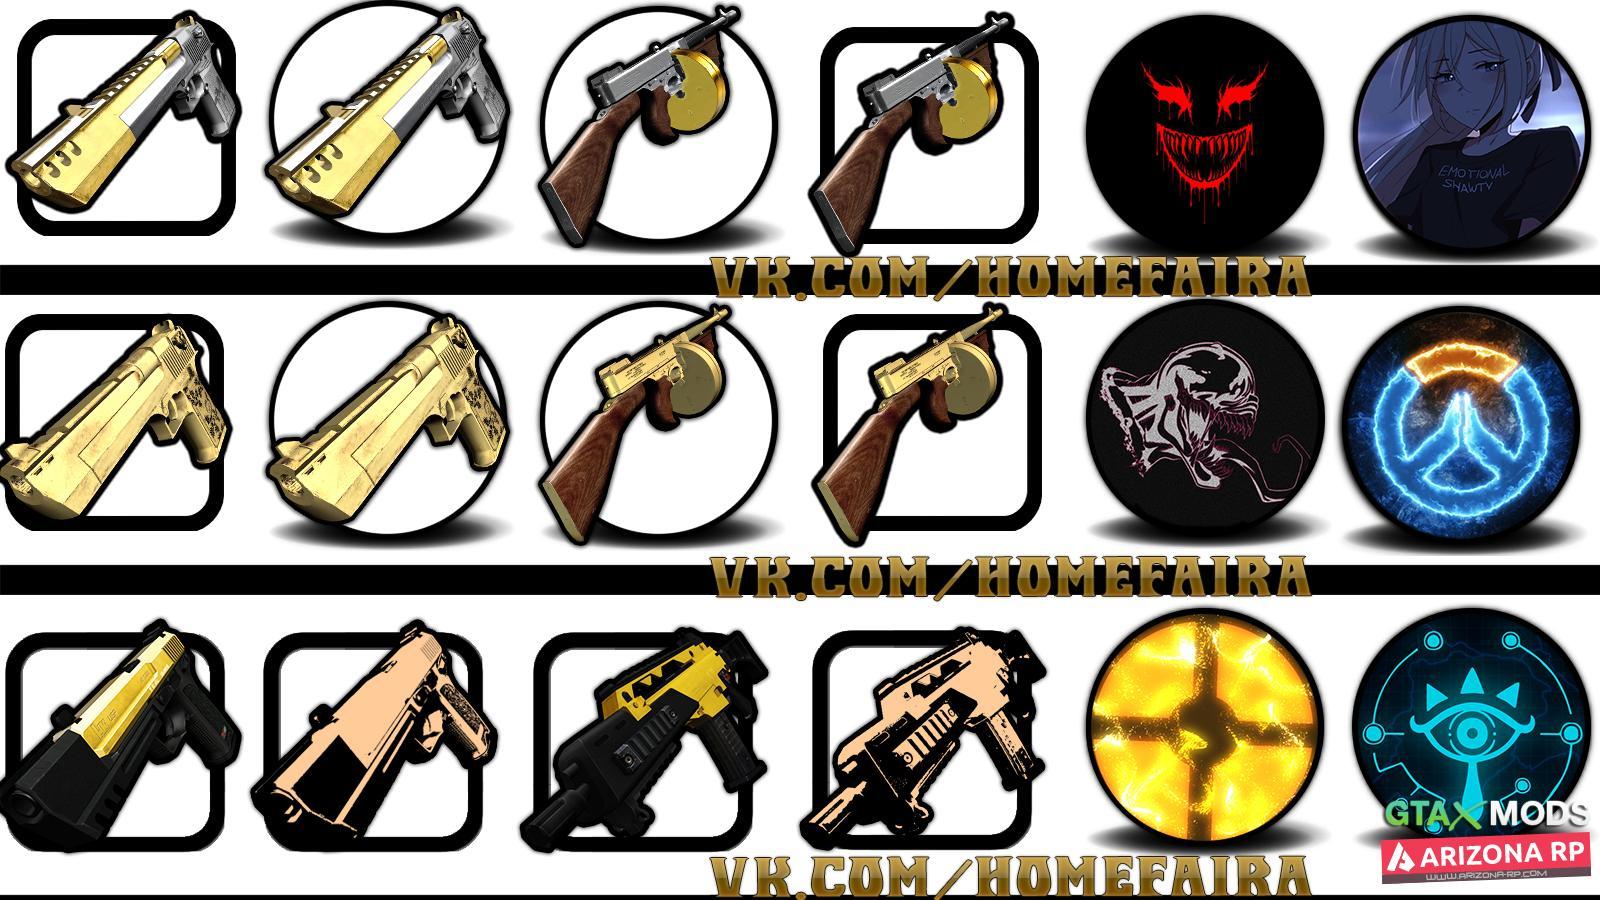 fist pack + gun pack